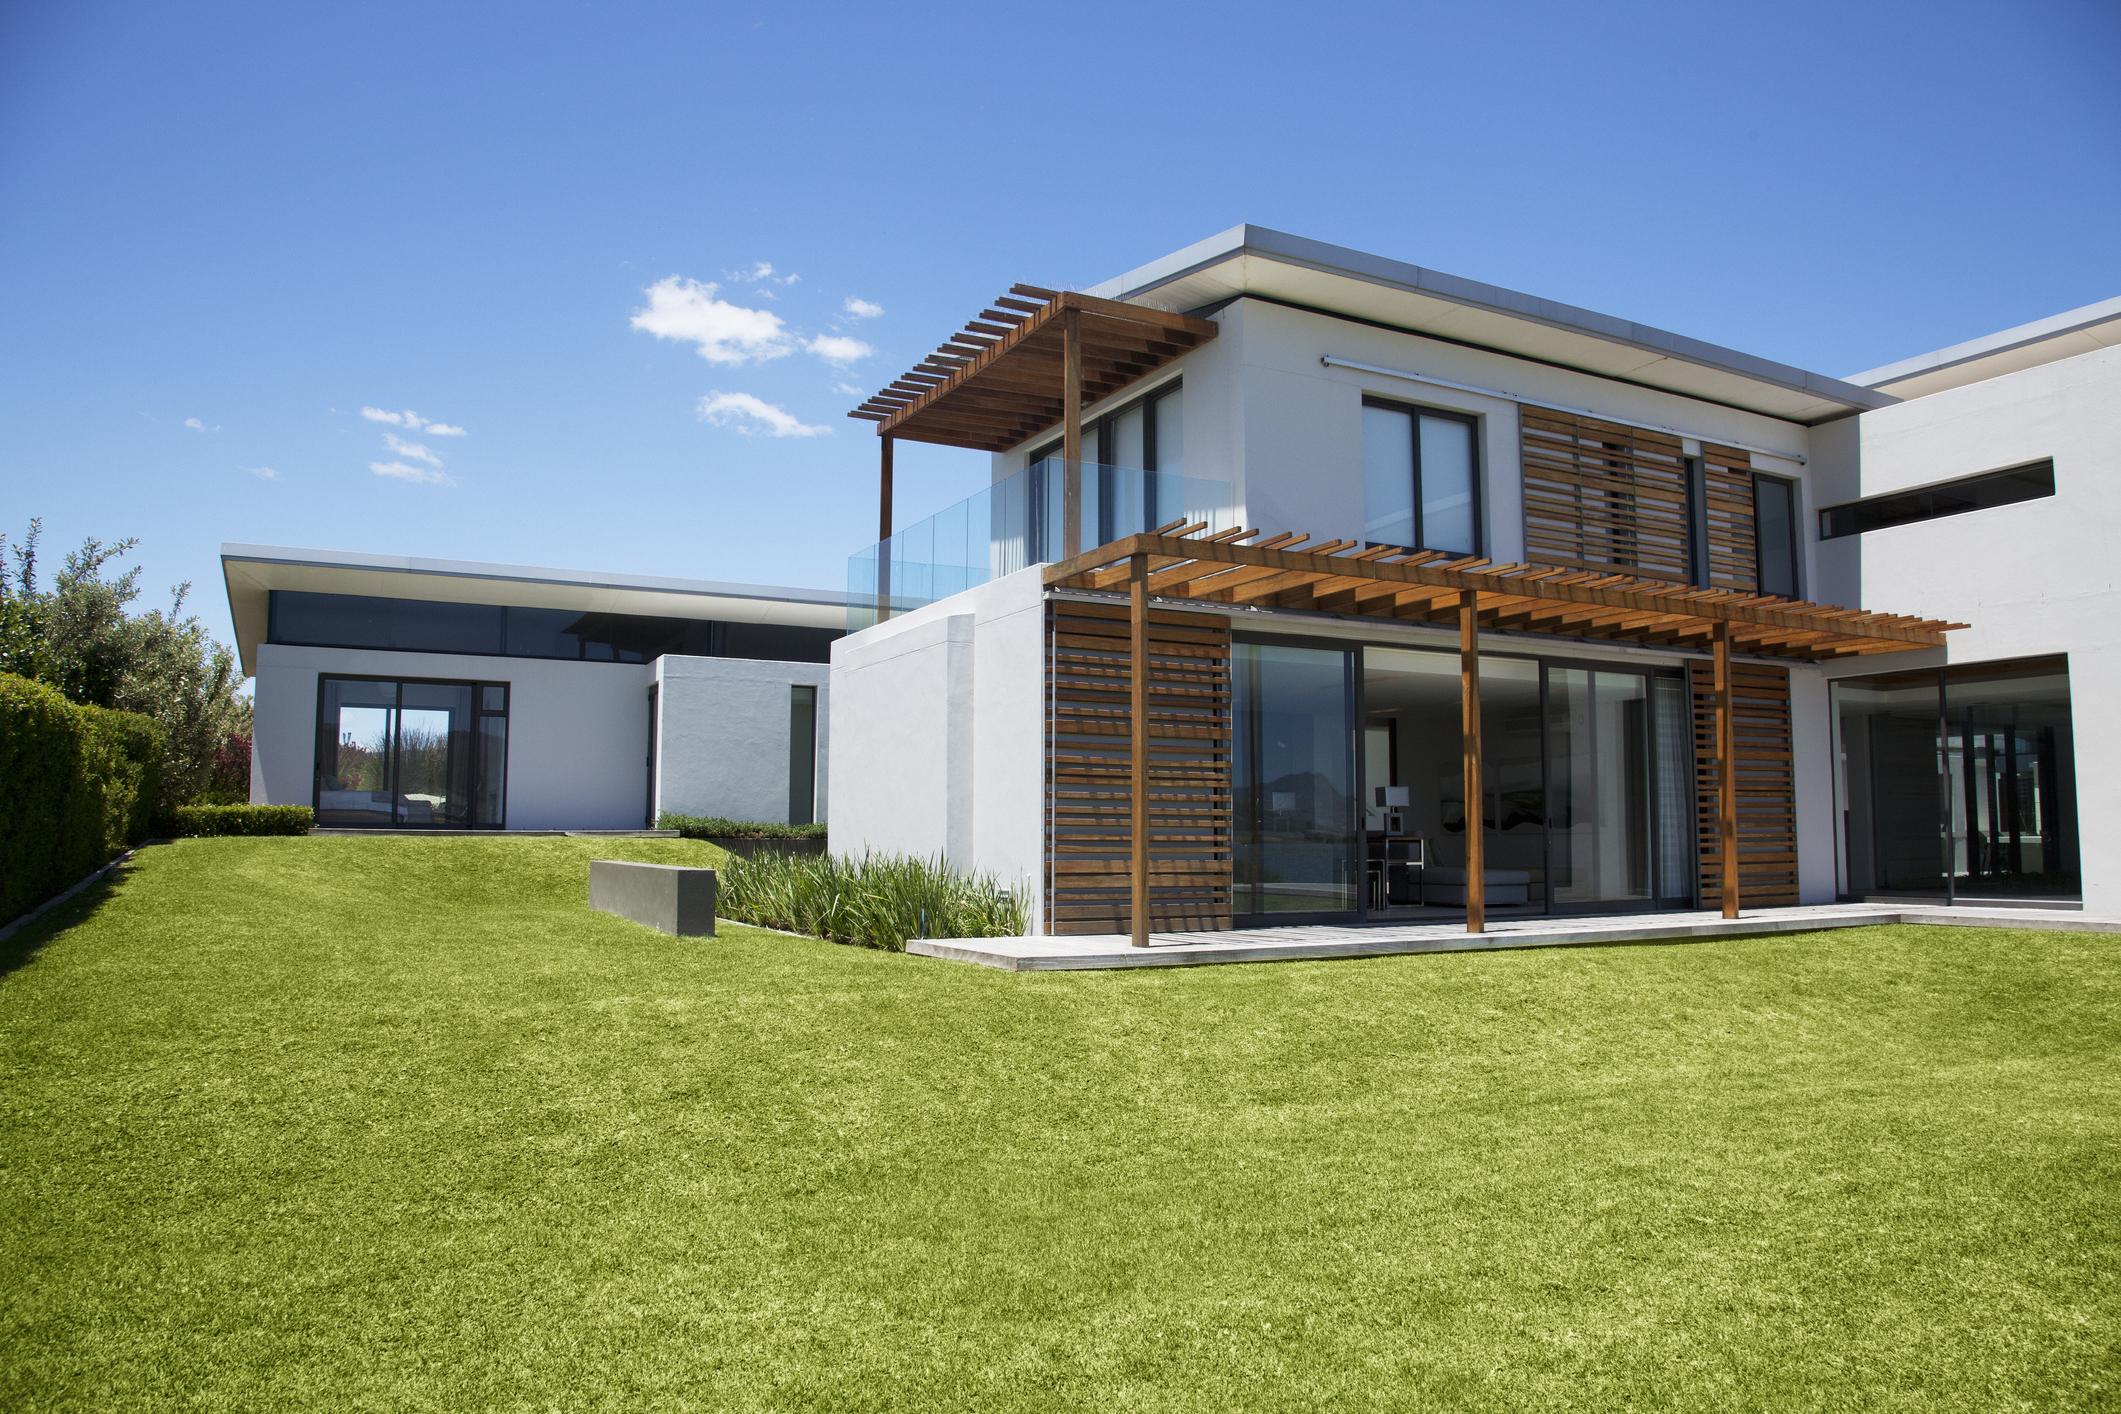 modern-house-and-yardjpg